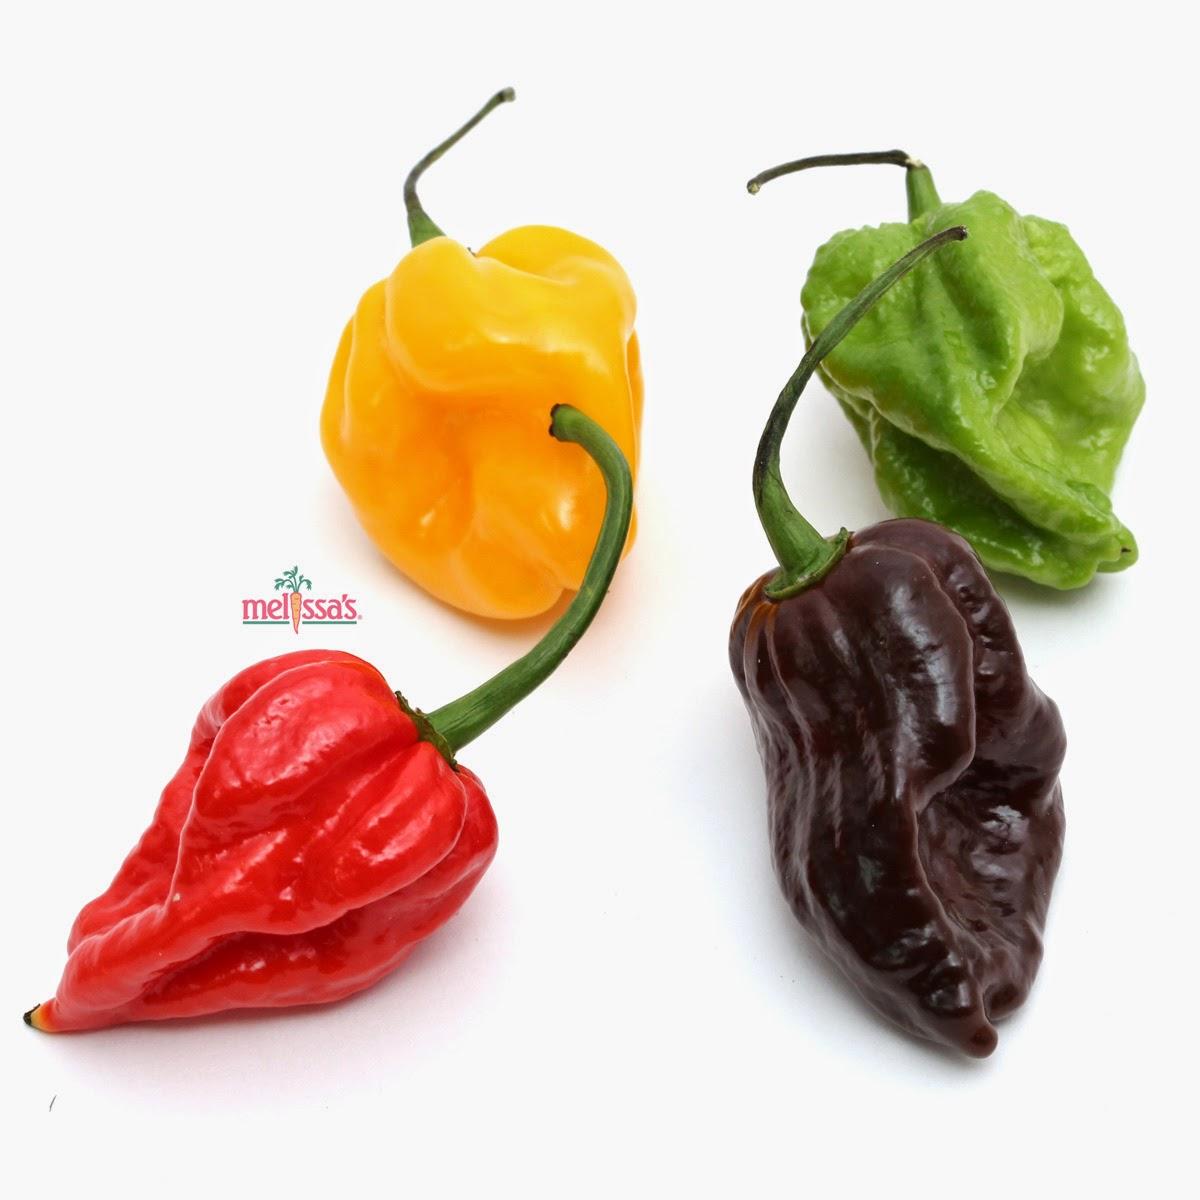 Melissa's Produce Blog: Bhut Jolokia vs. Scorpion Peppers | Super Hot ...